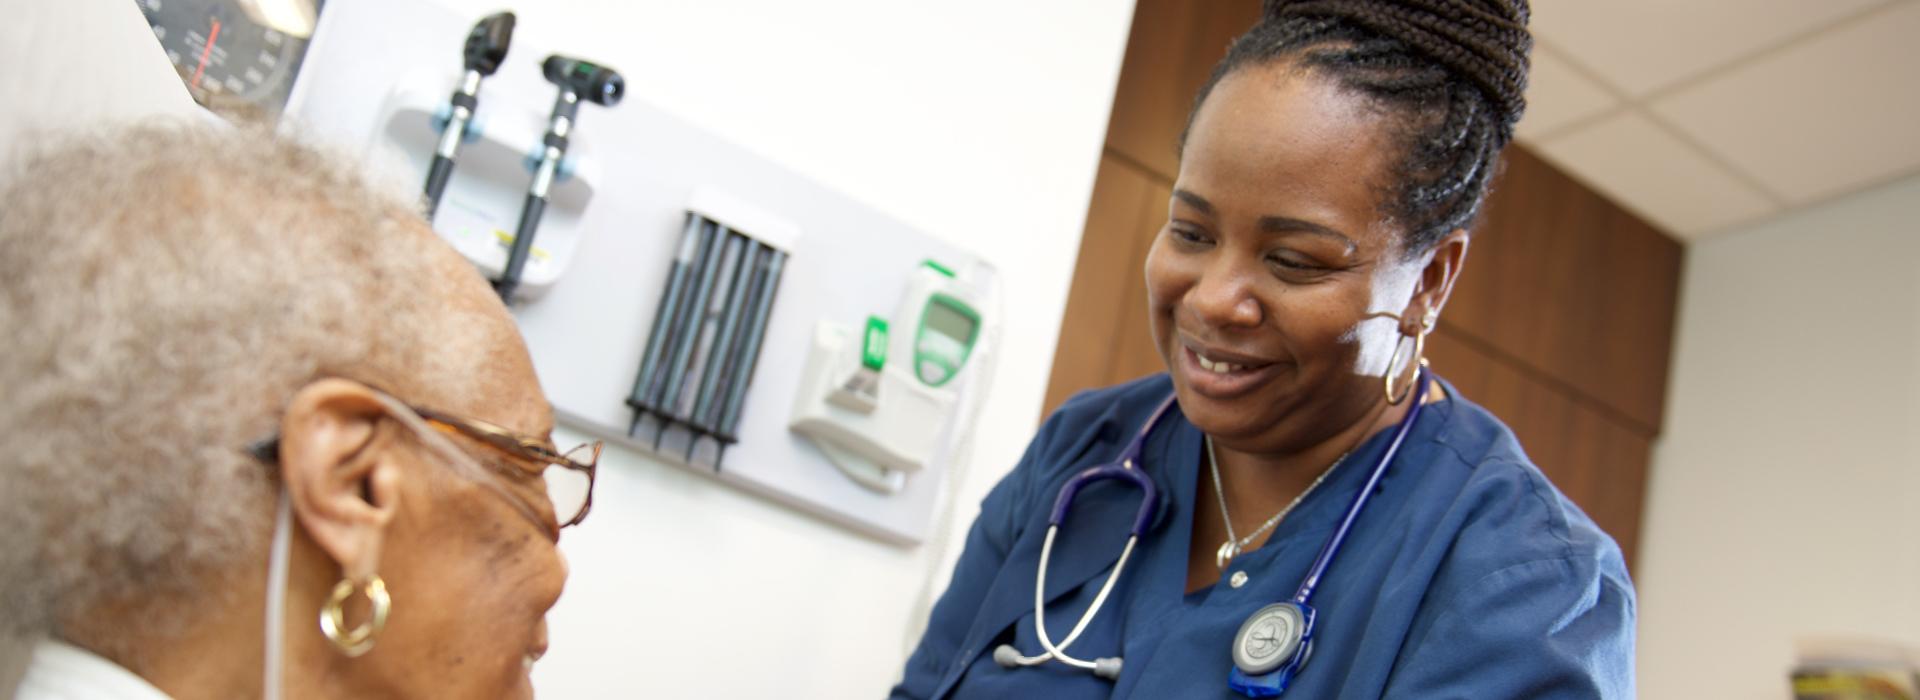 MedStar Good Samaritan Hospital